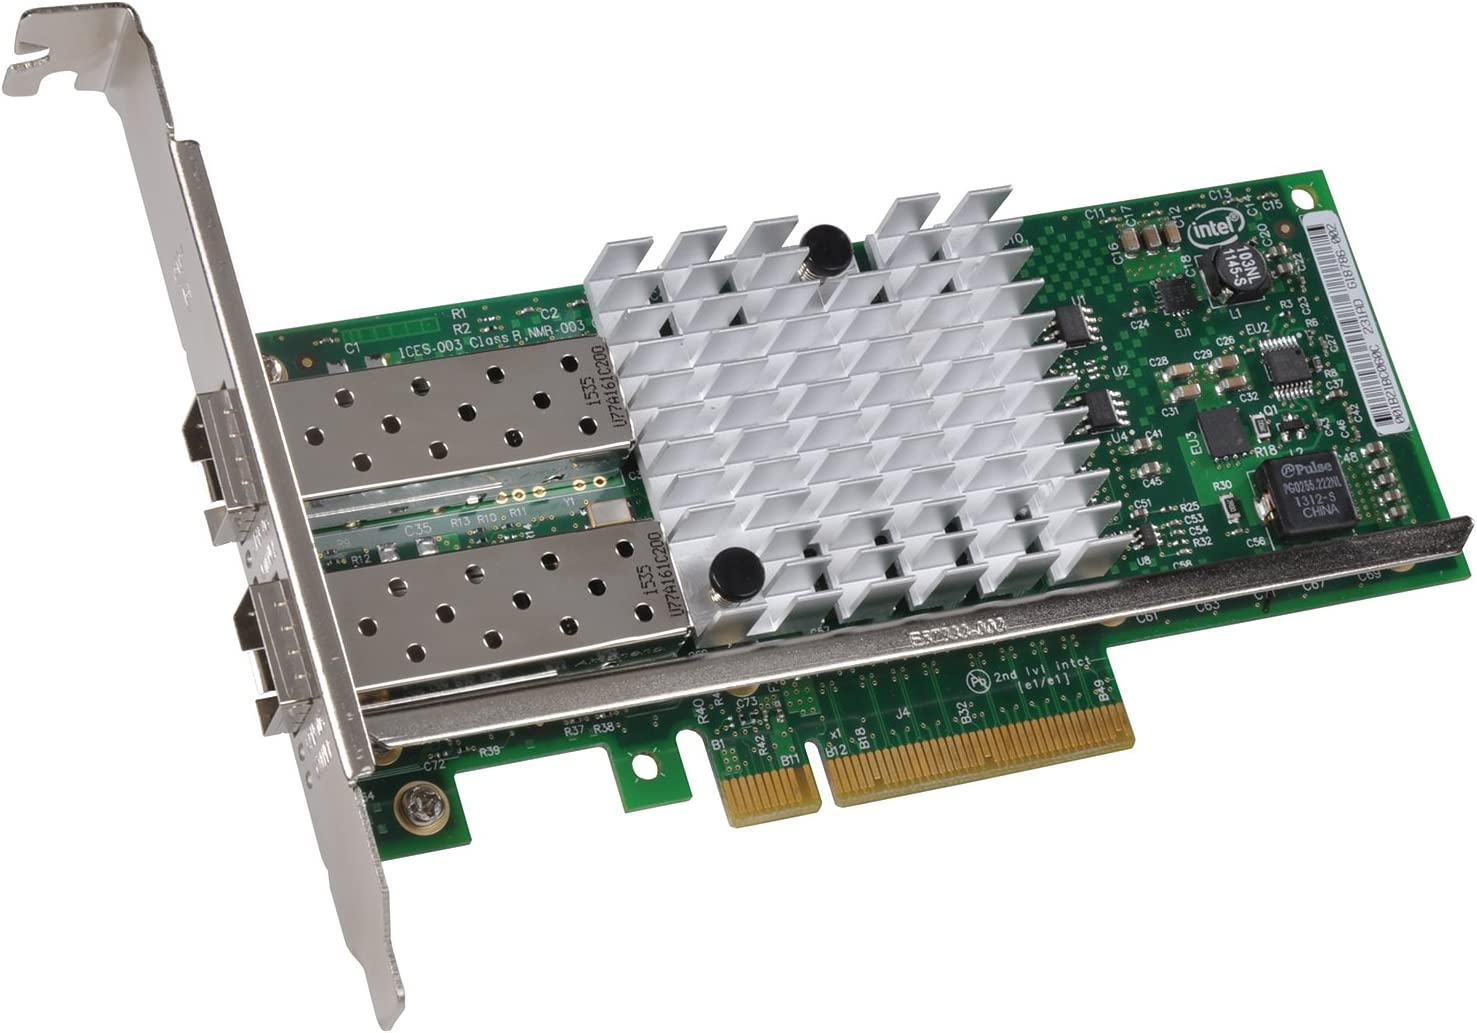 Sonnet Presto 10GbE SFP+ Network Adapter PCI Express 2.0 x8 Low Profile 10 Gb Ethernet (G10E-SFP-2XA-E2)